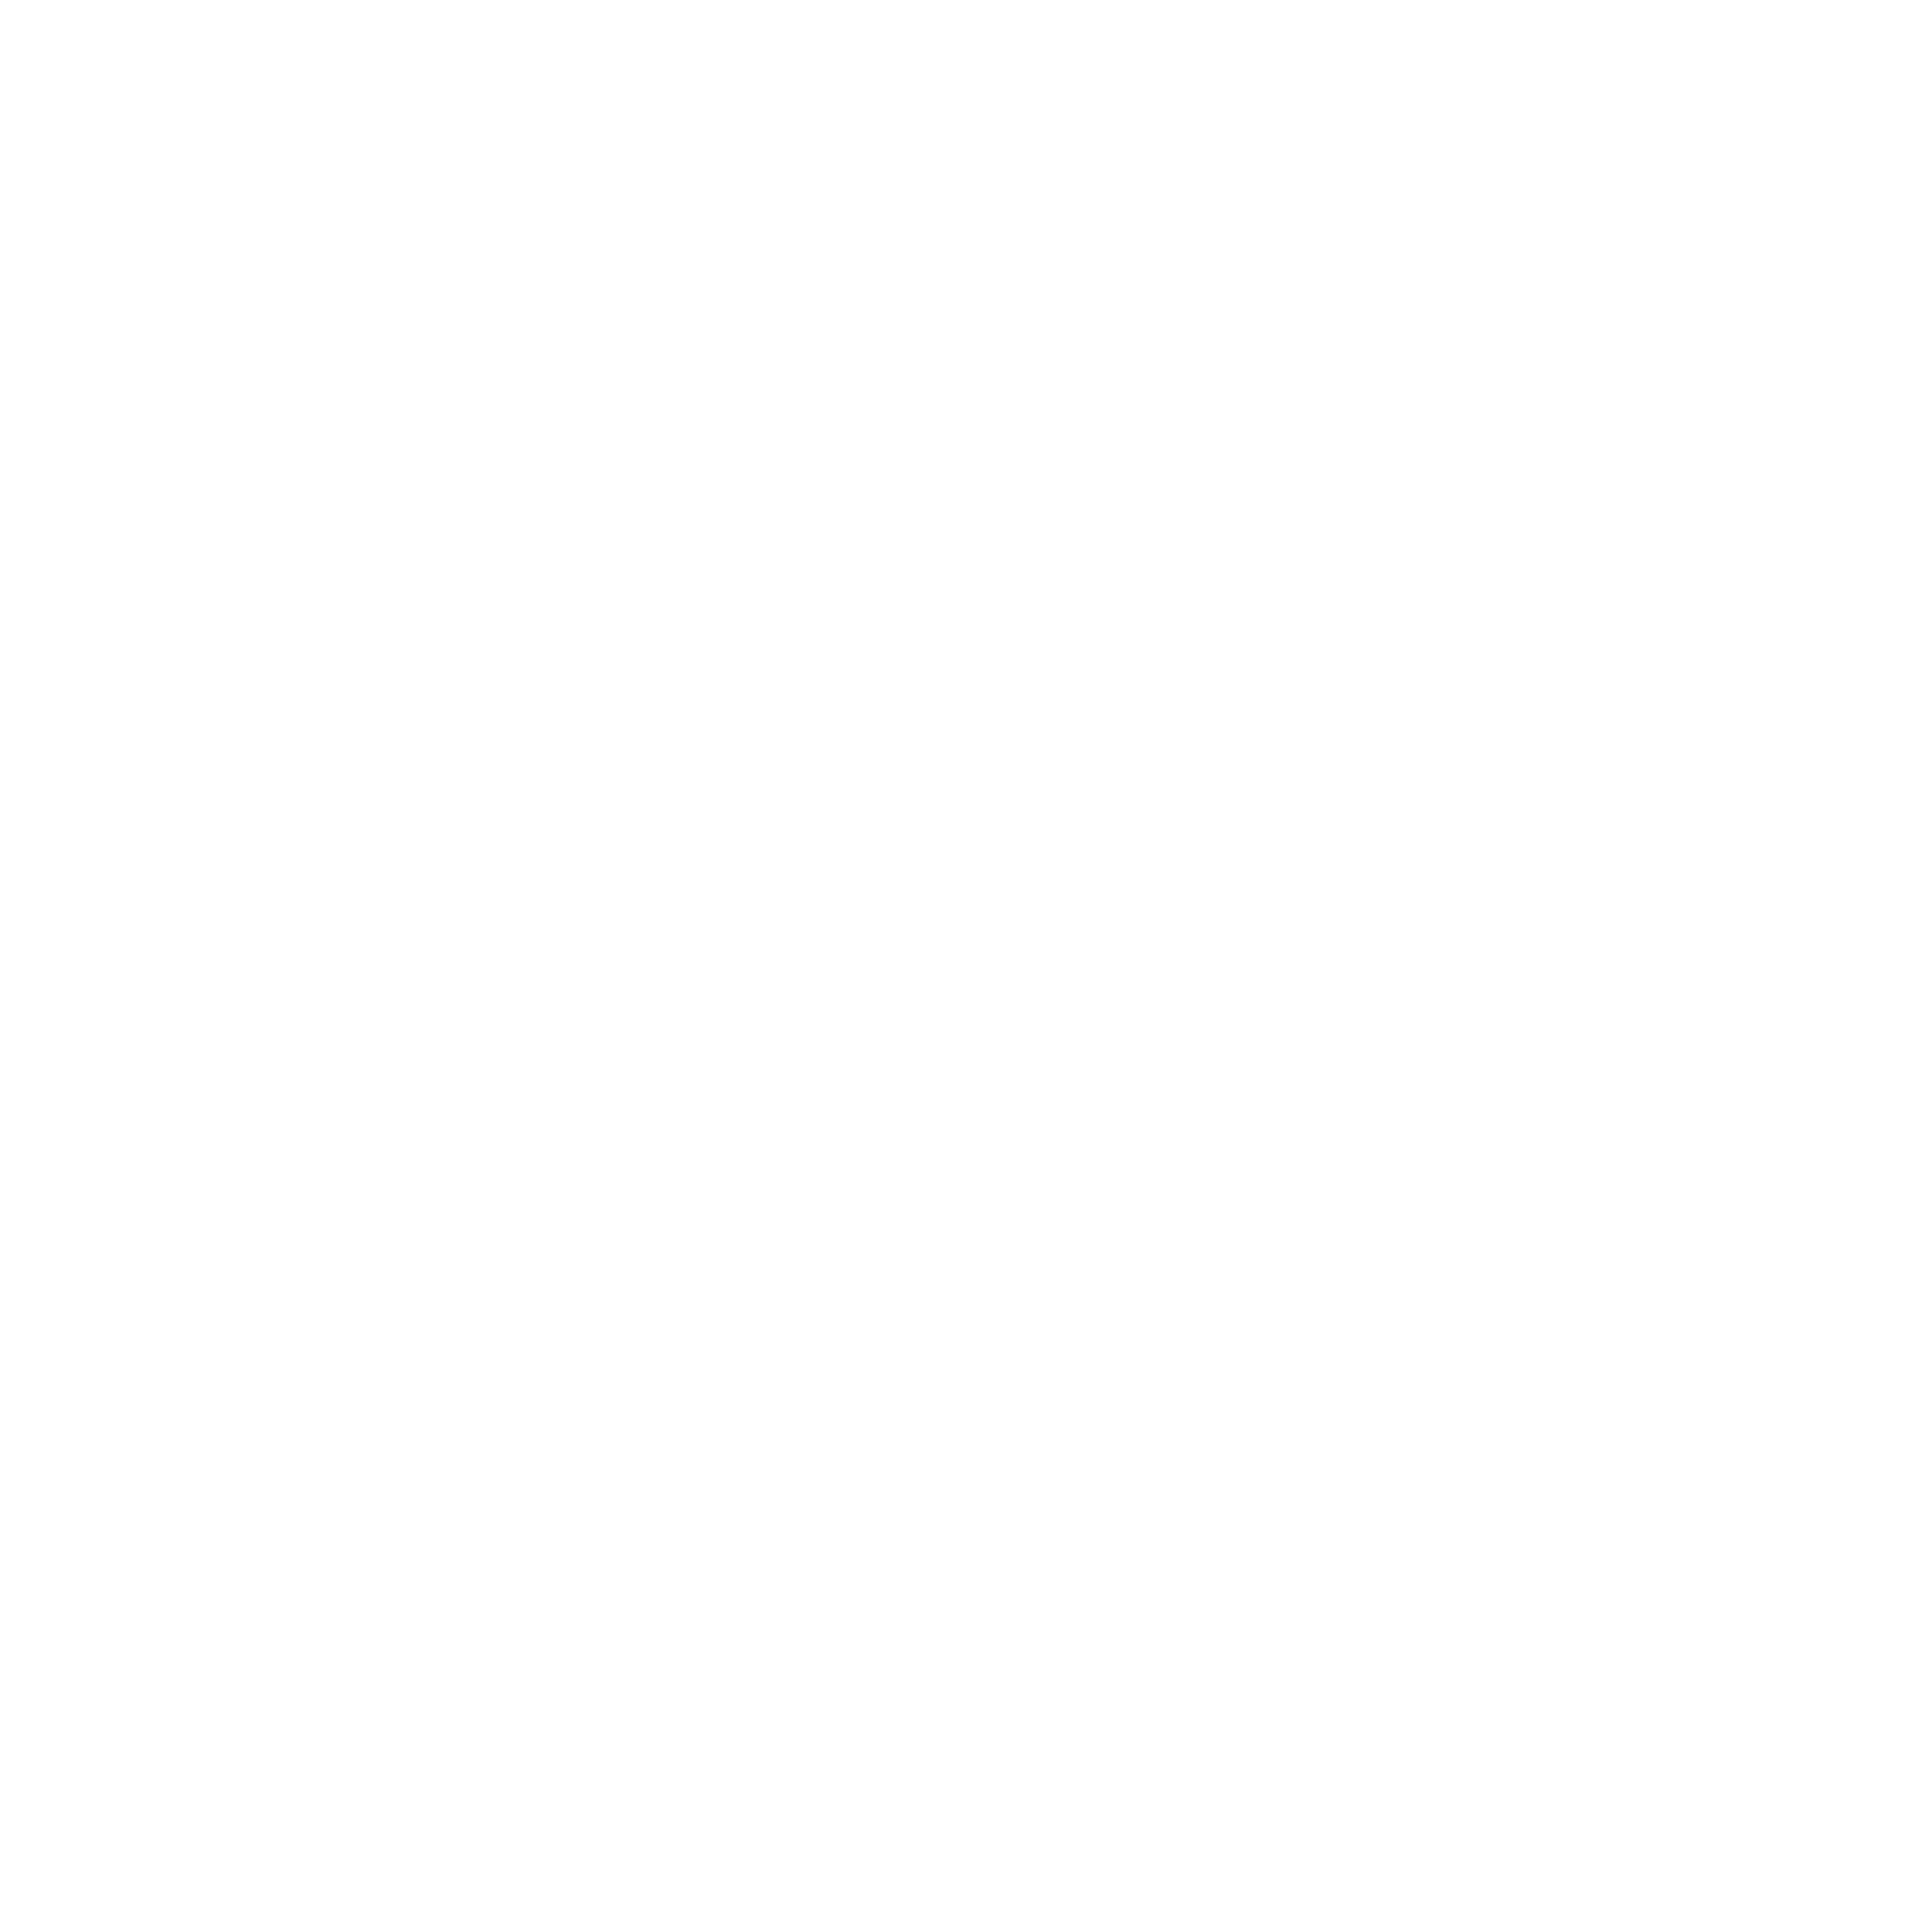 En kontrakt der er blevet skrevet under